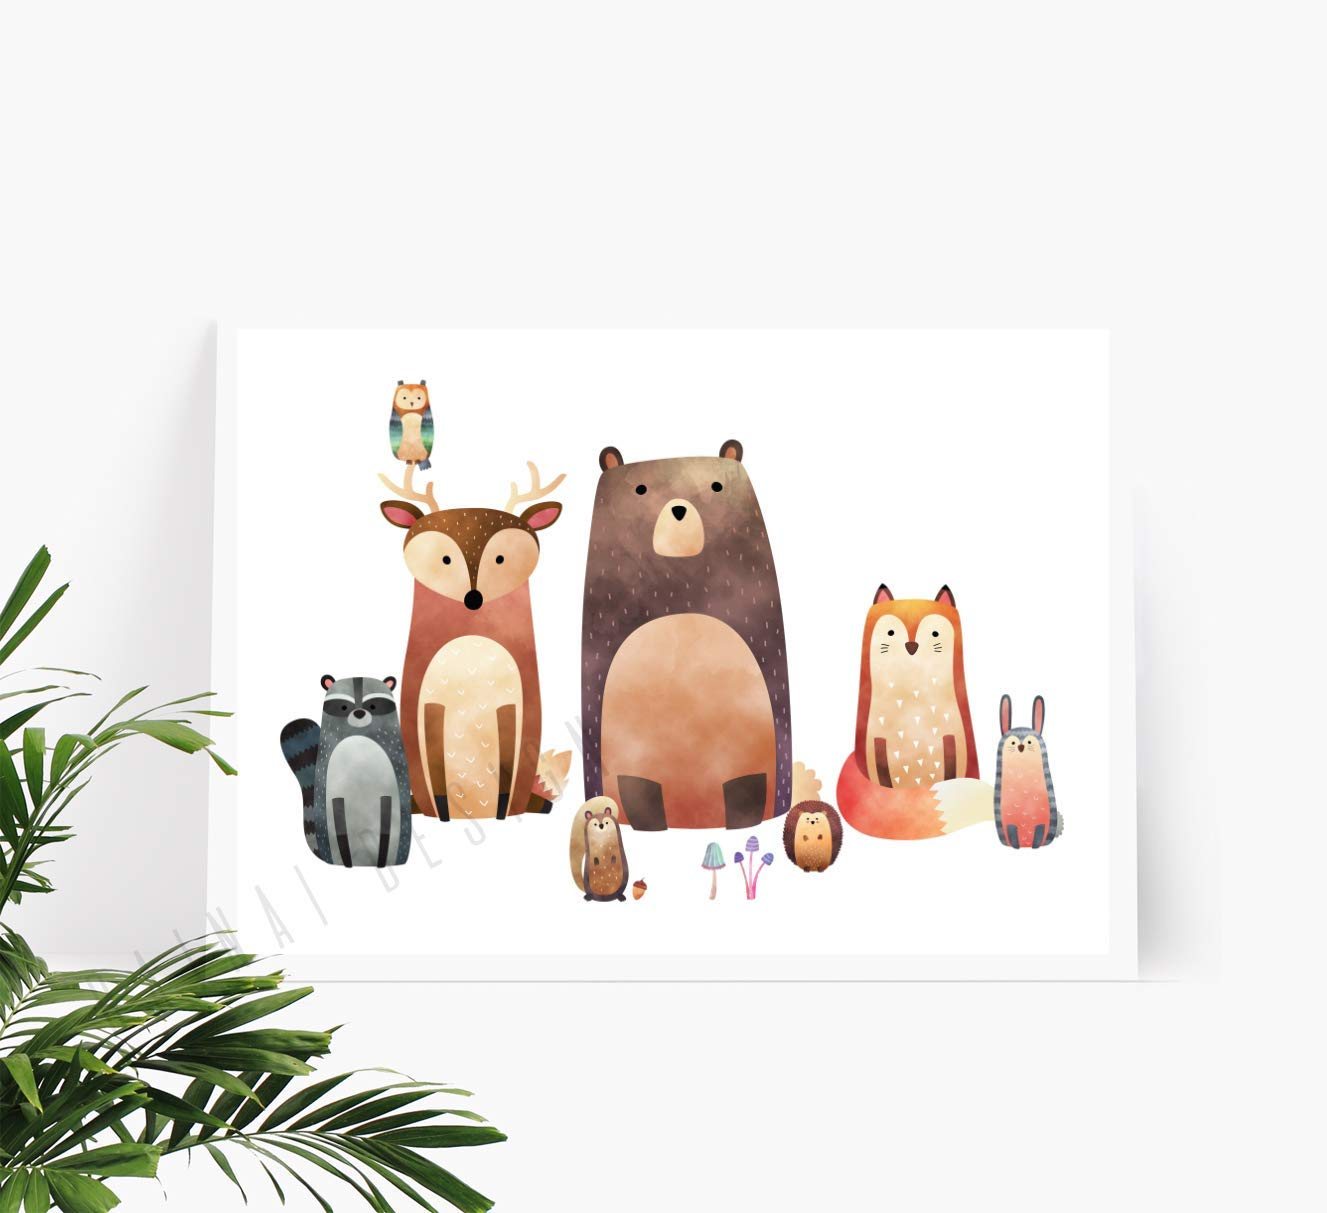 IGEL Kunstdruck Poster Bild Tier Kinderzimmer Wald skandinavisch WALDFREUNDE